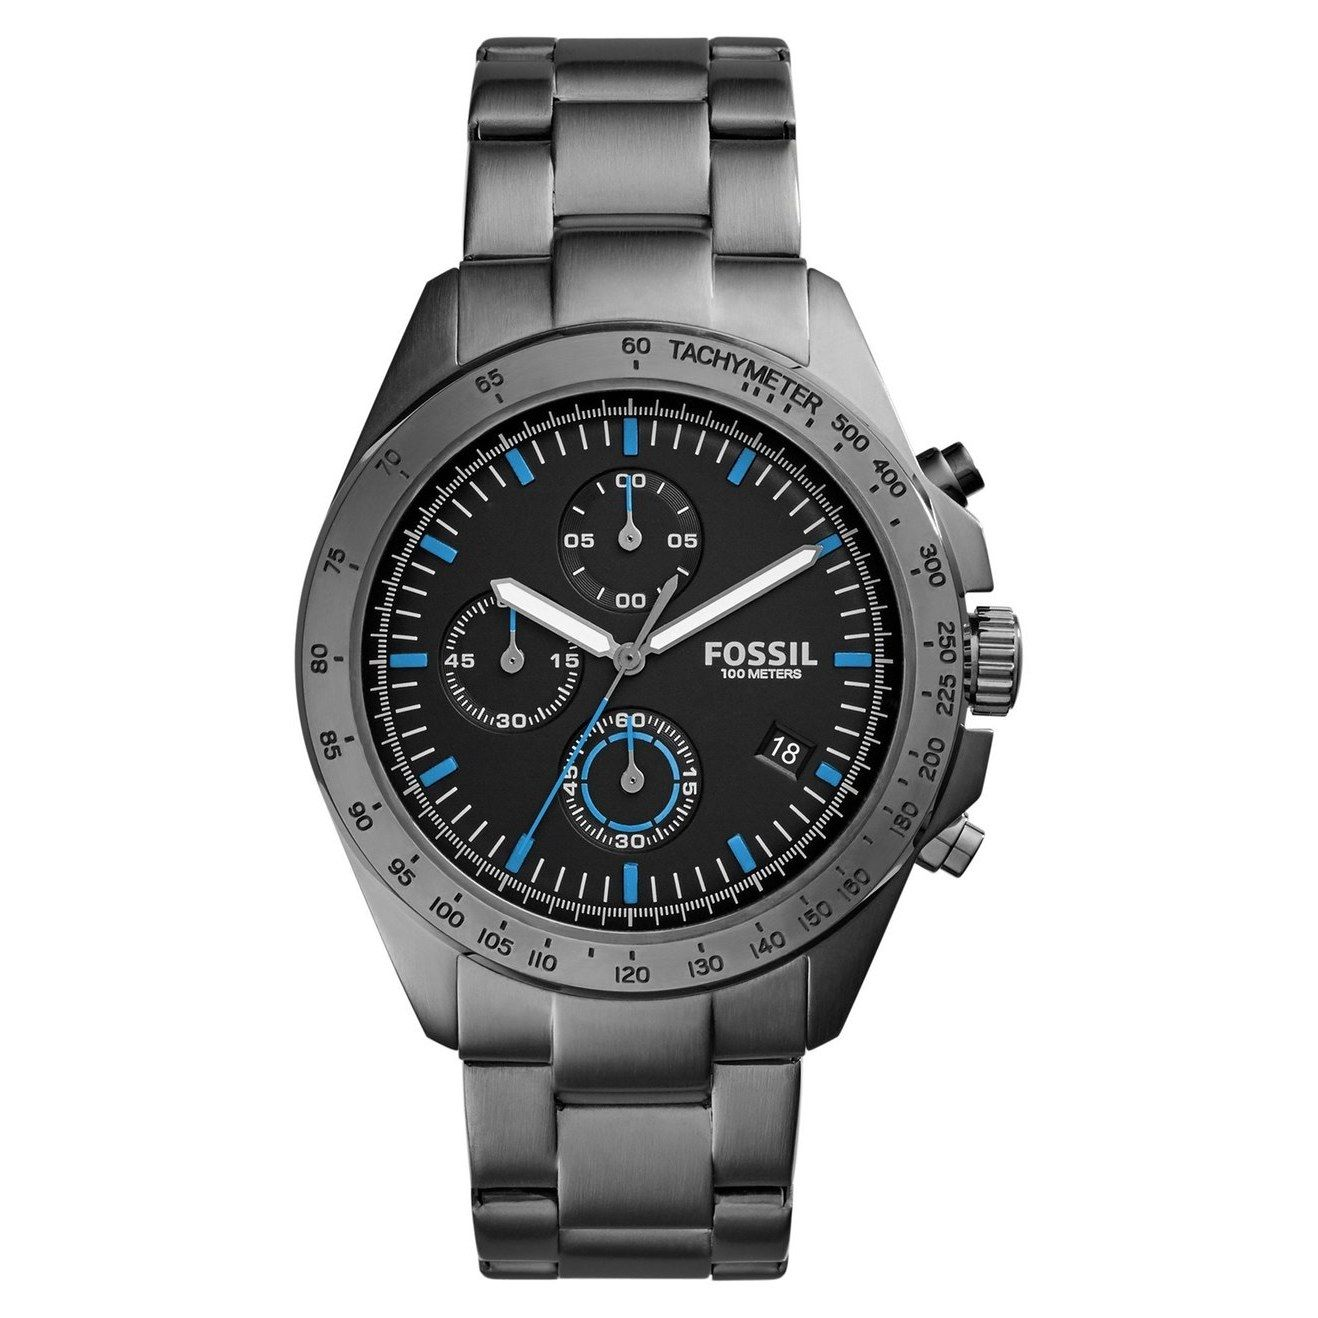 Fossil Men's CH3047 Sport 54 Chronograph Black Dial Grey